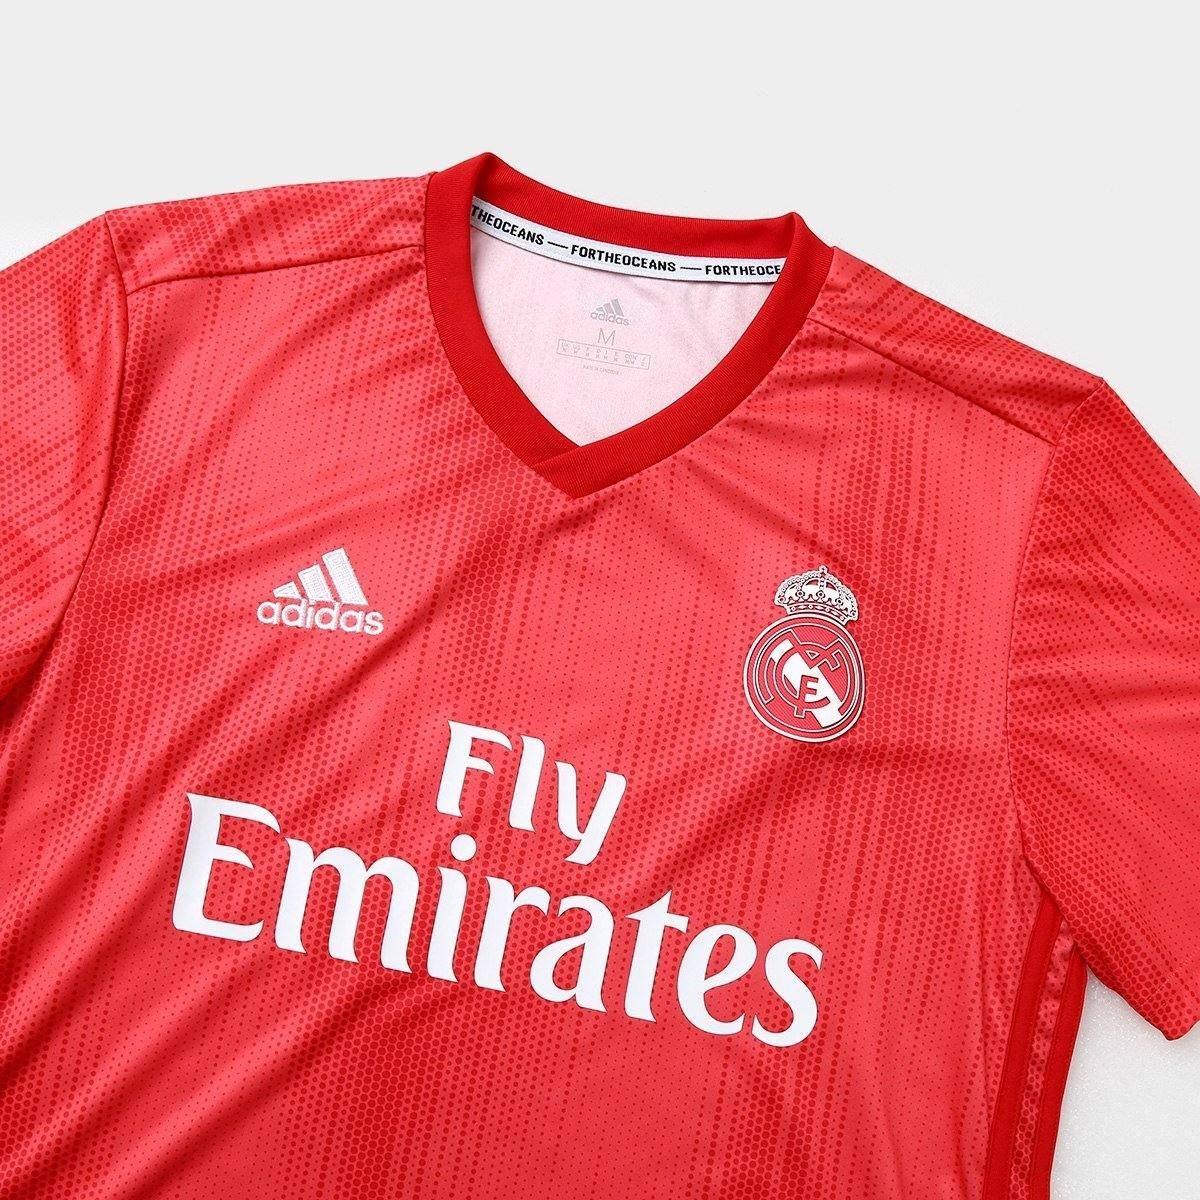 51d59632 Camisa Real Madrid 2018-2019 Uniforme 3 Frete Grátis - R$ 135,96 em ...